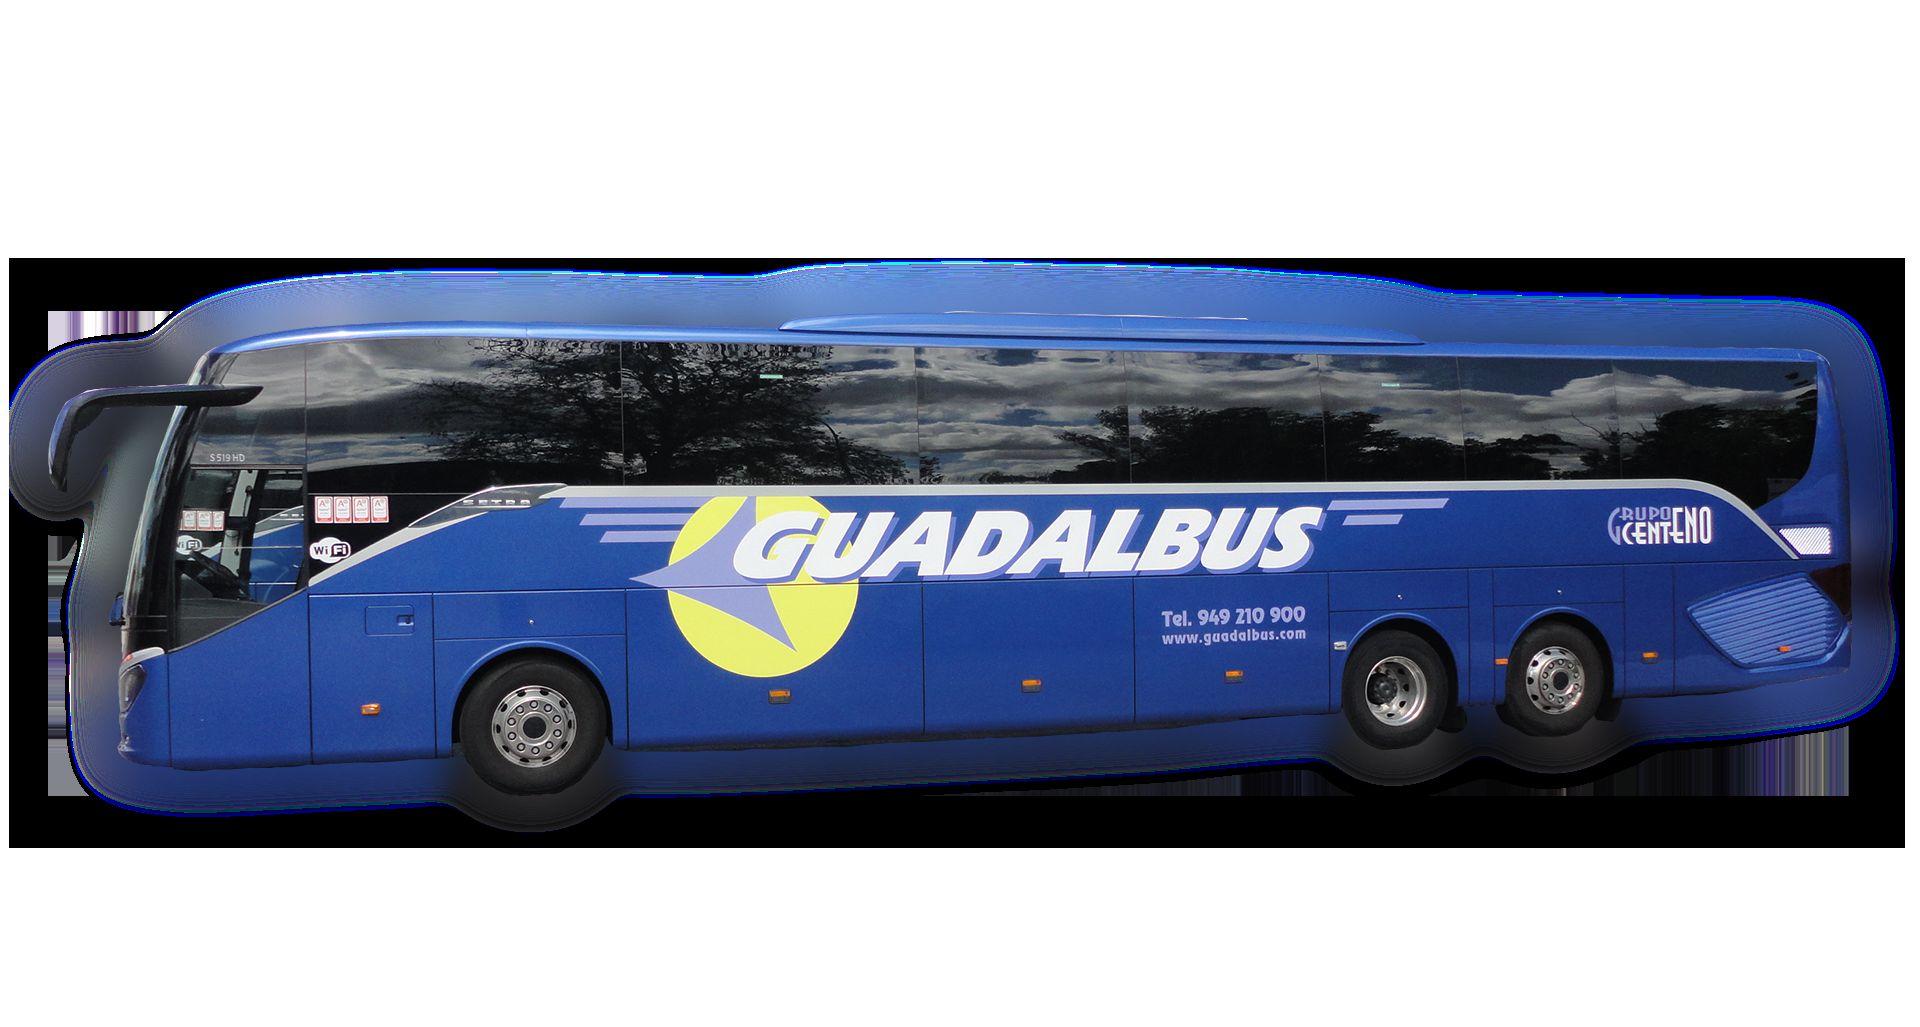 Foto 9 de Autocares en Guadalajara | Guadalbus